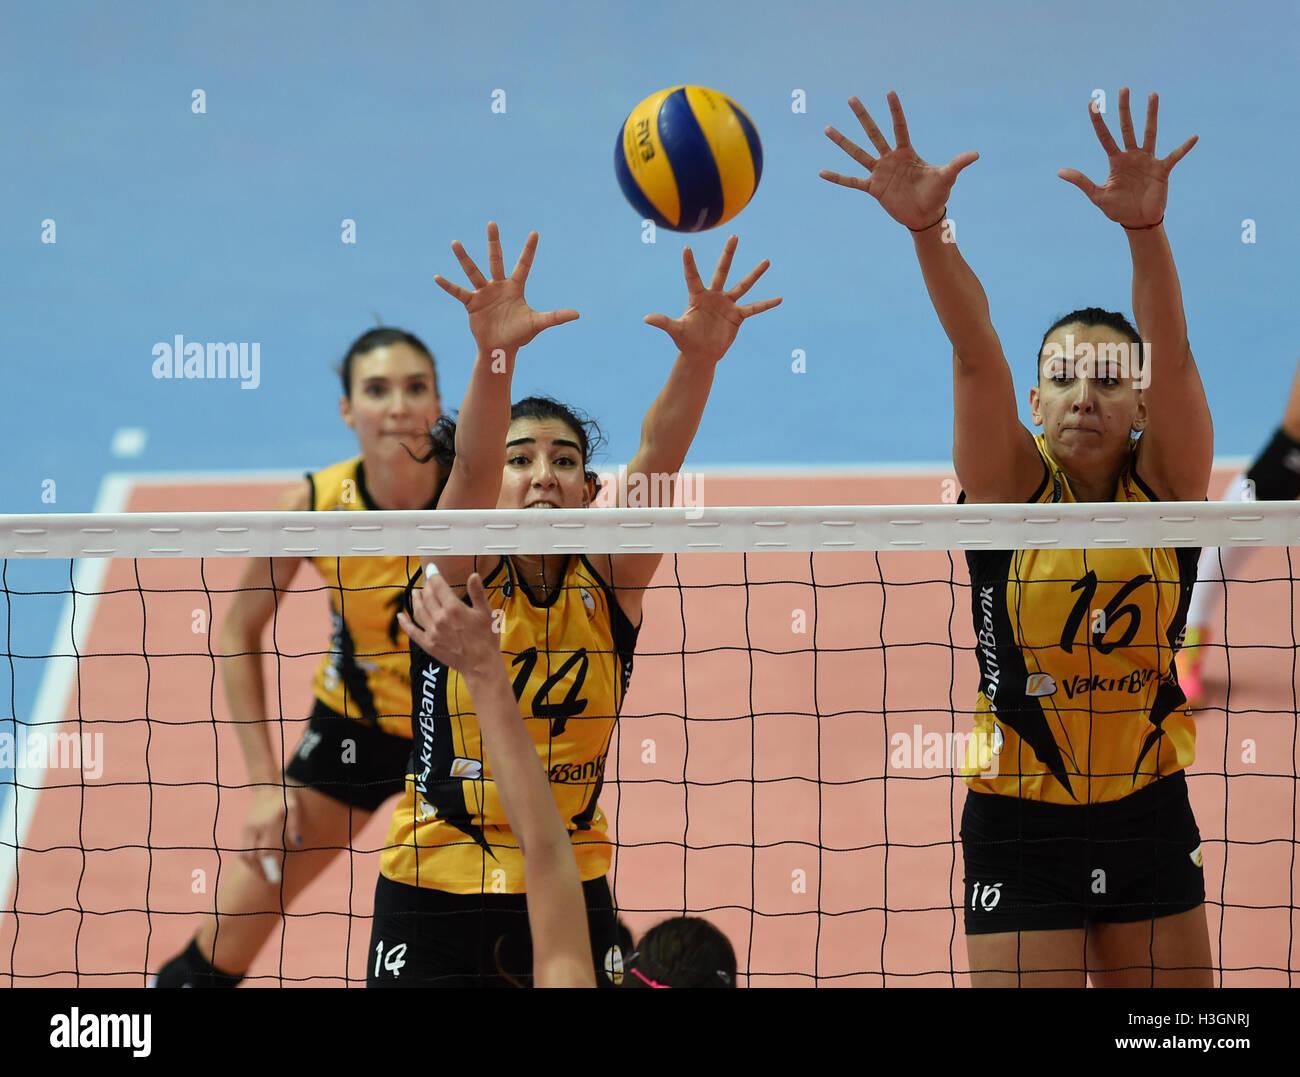 (161009) -- ISTANBUL, le 9 octobre 2016(Xinhua) -- Vakifbank player Milena Rasic (R) et Durul Melis bloquer la balle Photo Stock